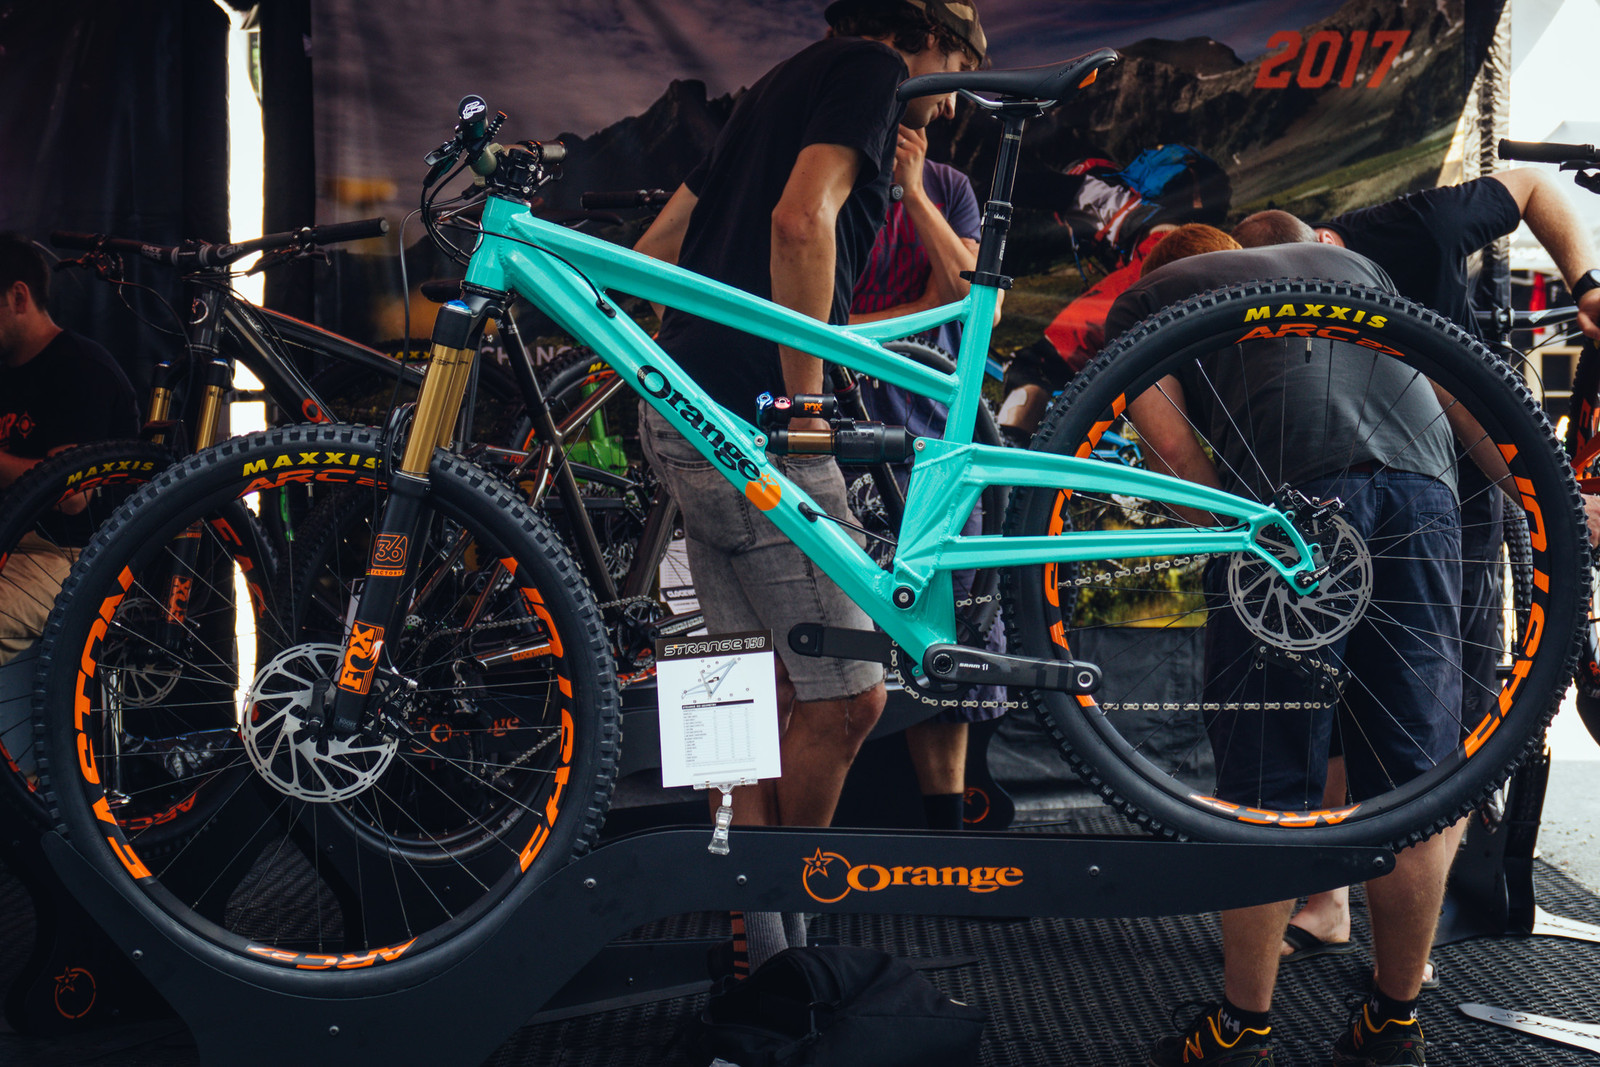 Orange Strange Long Reach 29er Prototypes - EUROBIKE - 2017 Enduro and Trail Bikes - Mountain Biking Pictures - Vital MTB